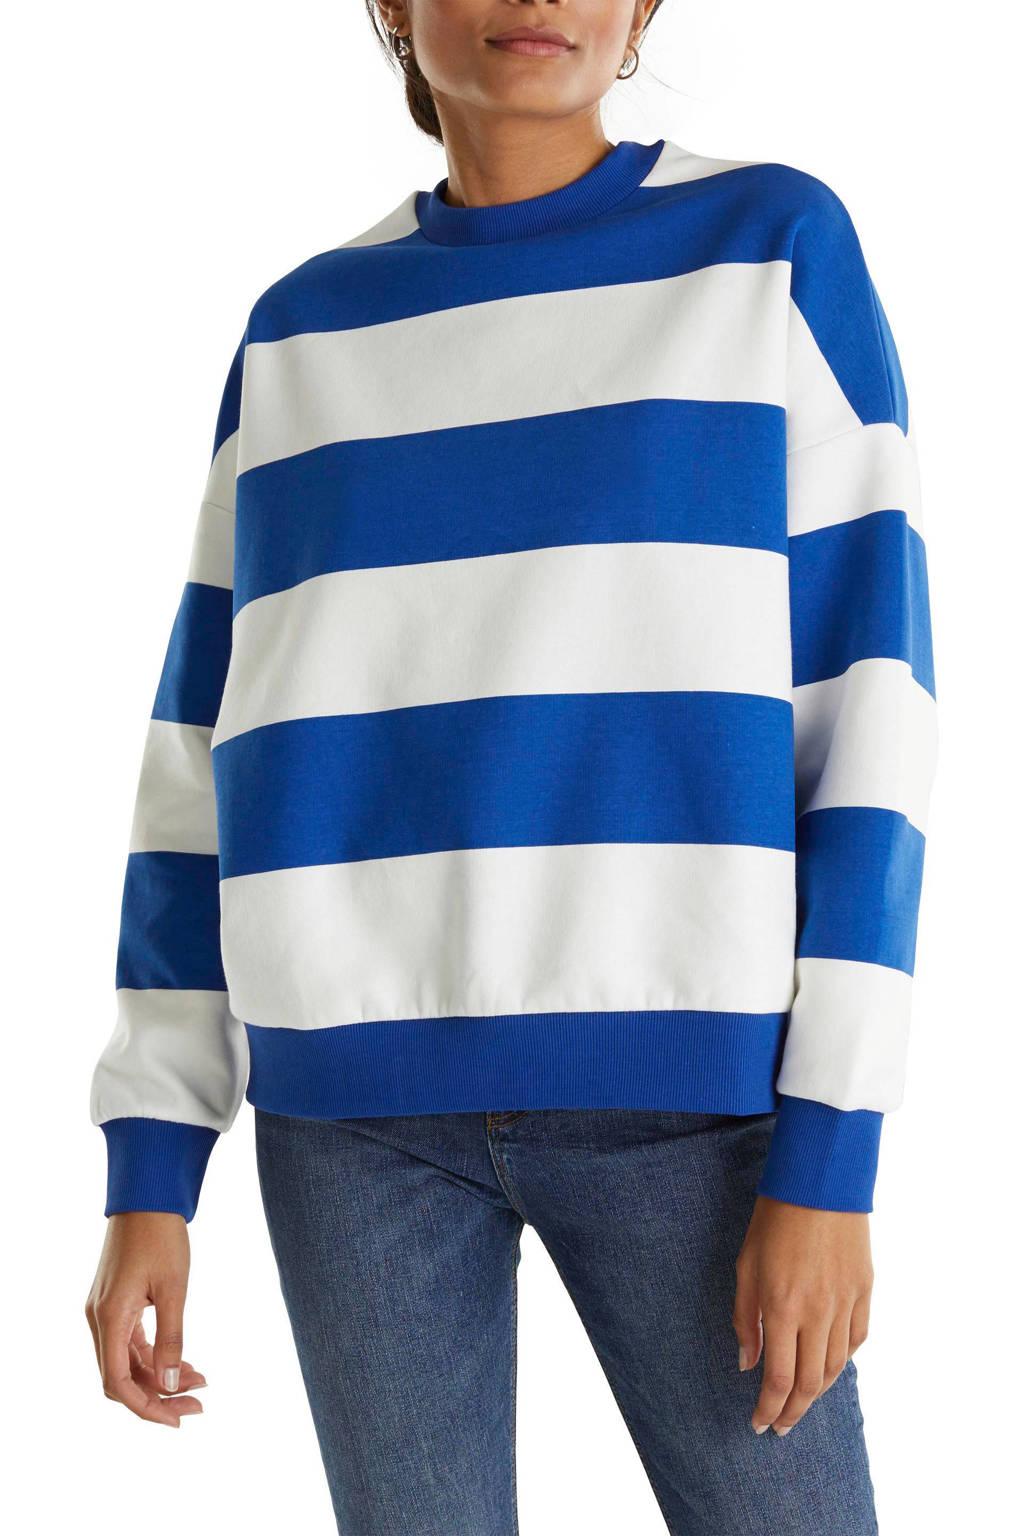 edc Women gestreepte sweater blauw/wit, Blauw/wit